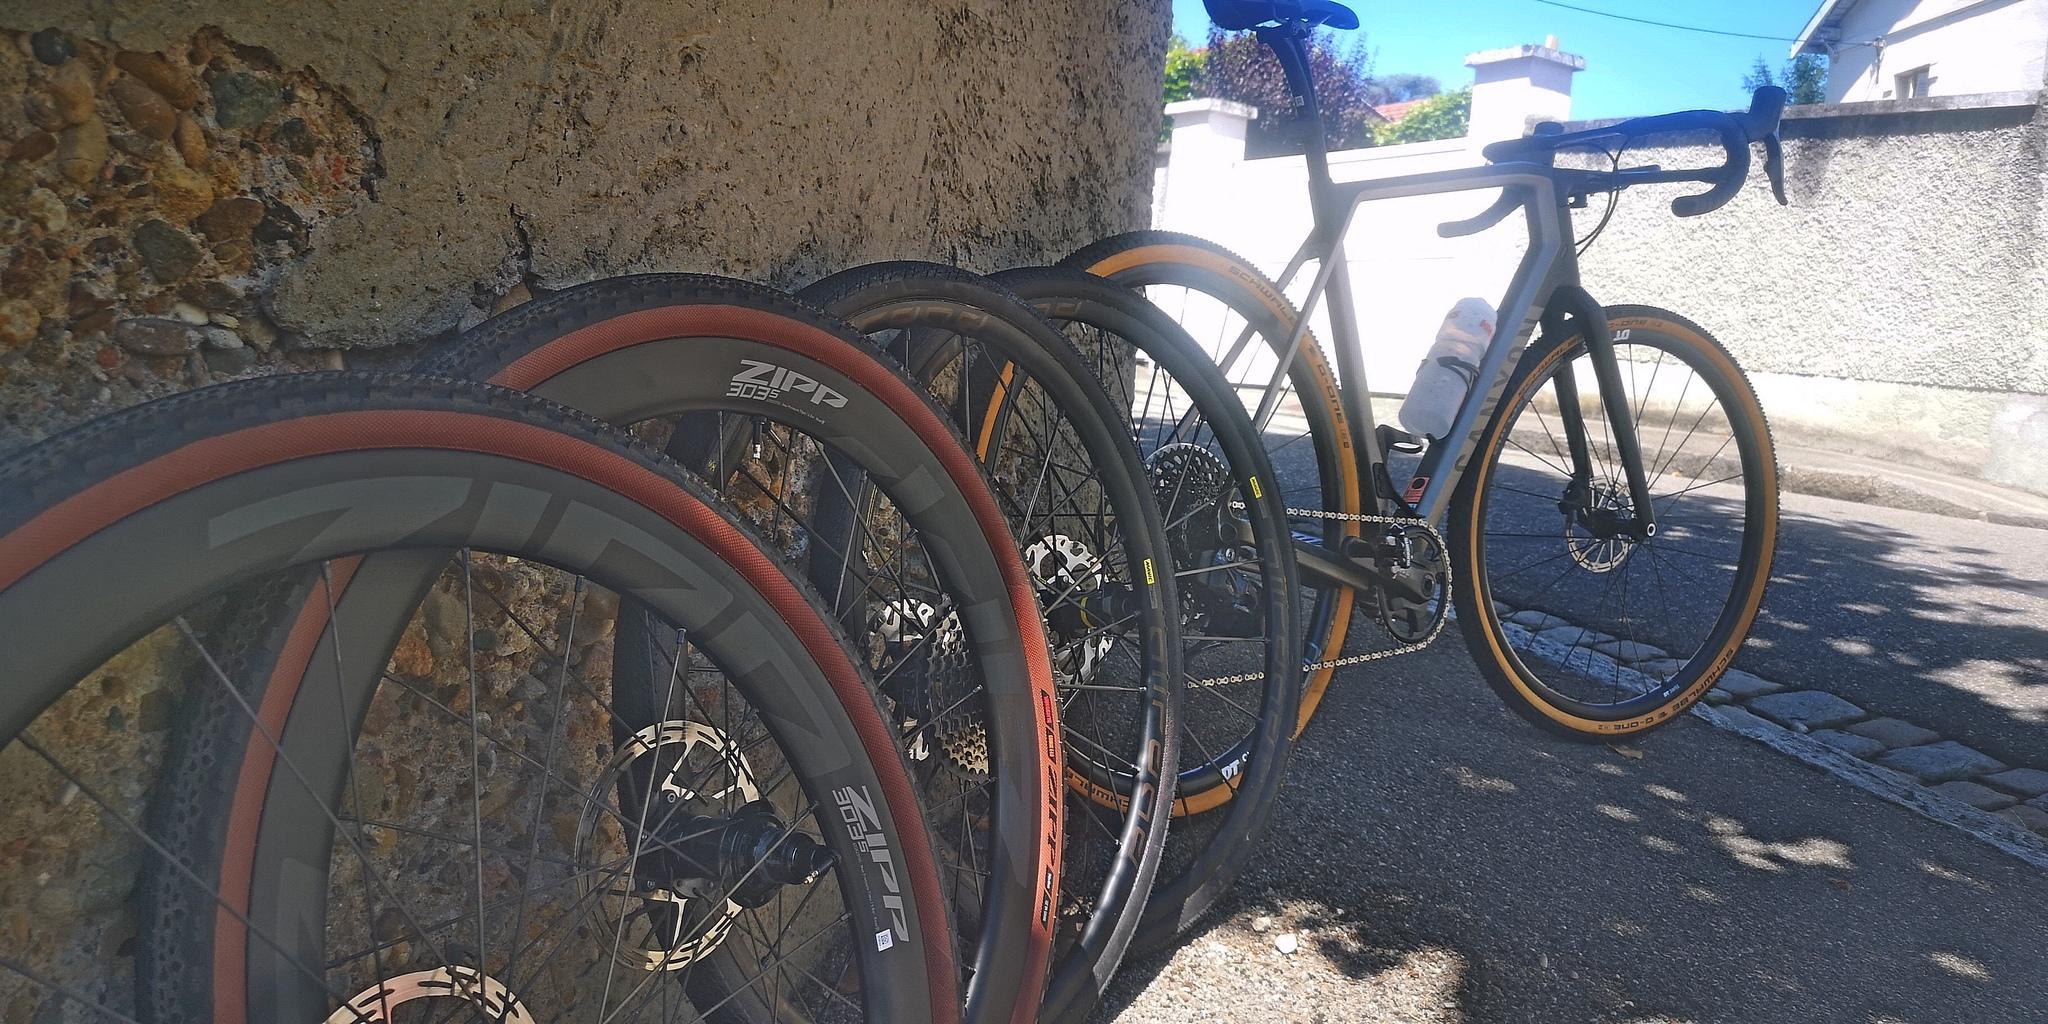 Match roues Gravel 2020